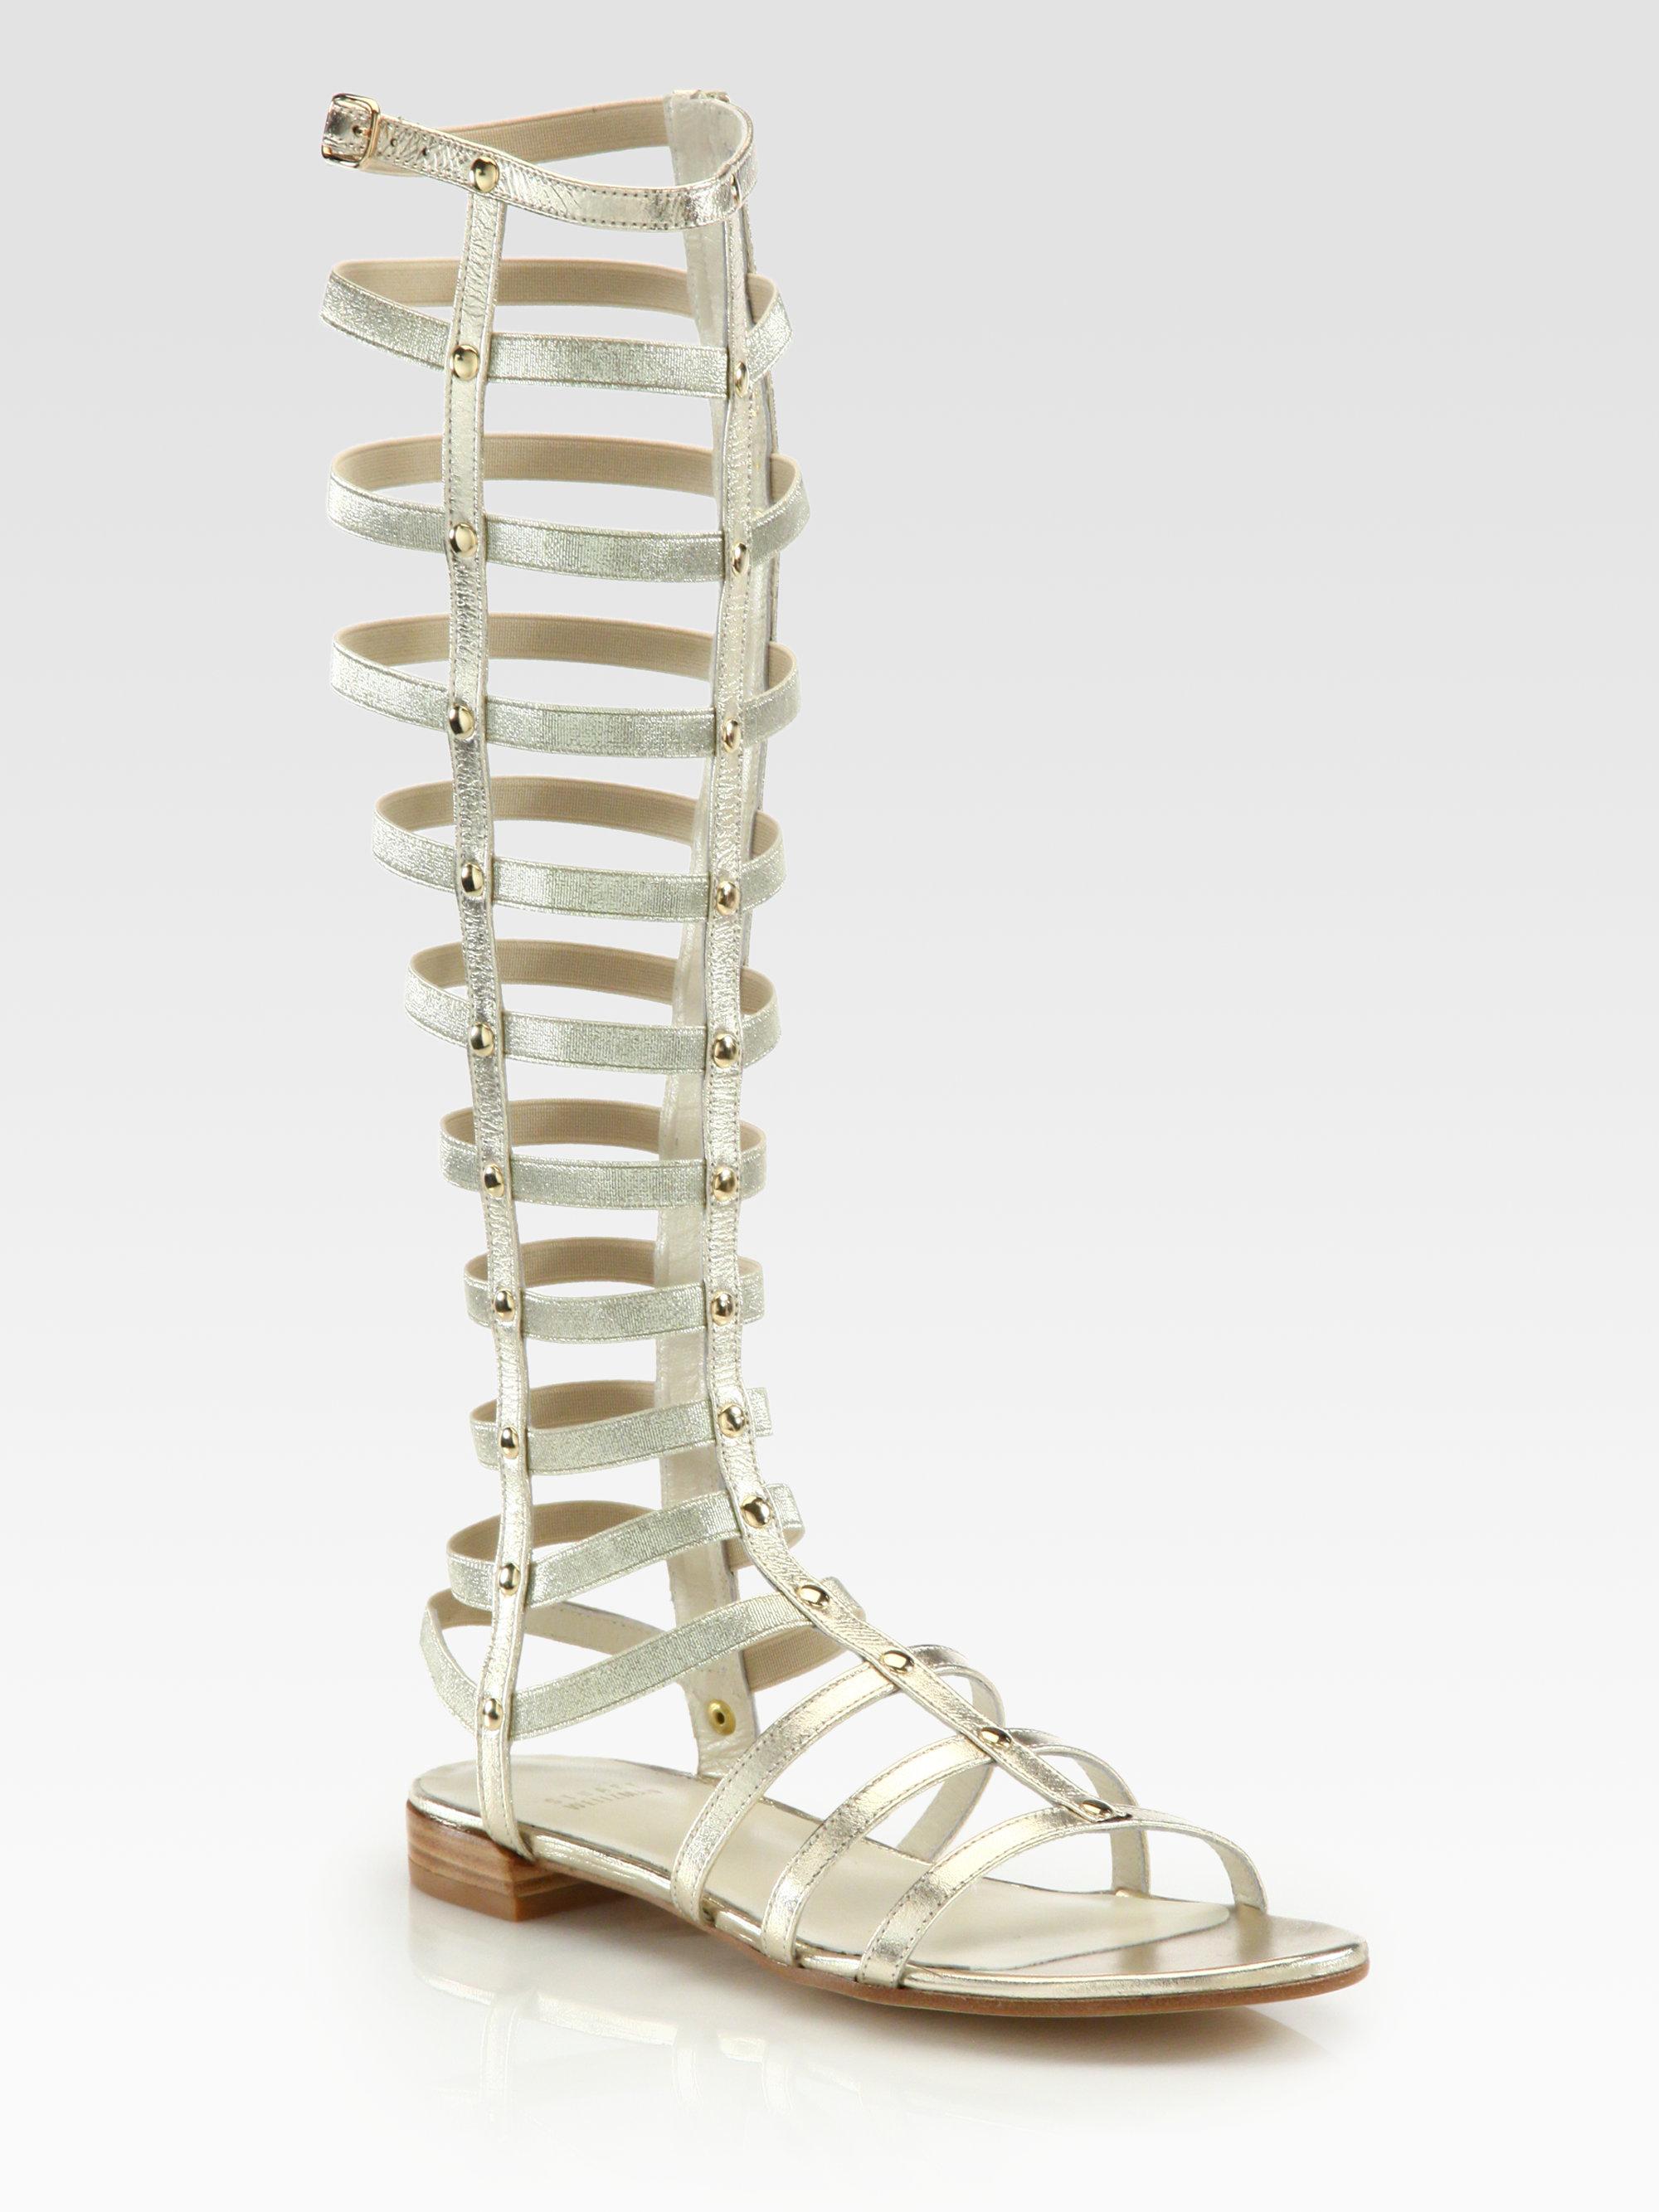 Stuart Weitzman Tall Gladiator Metallic Leather Sandals In